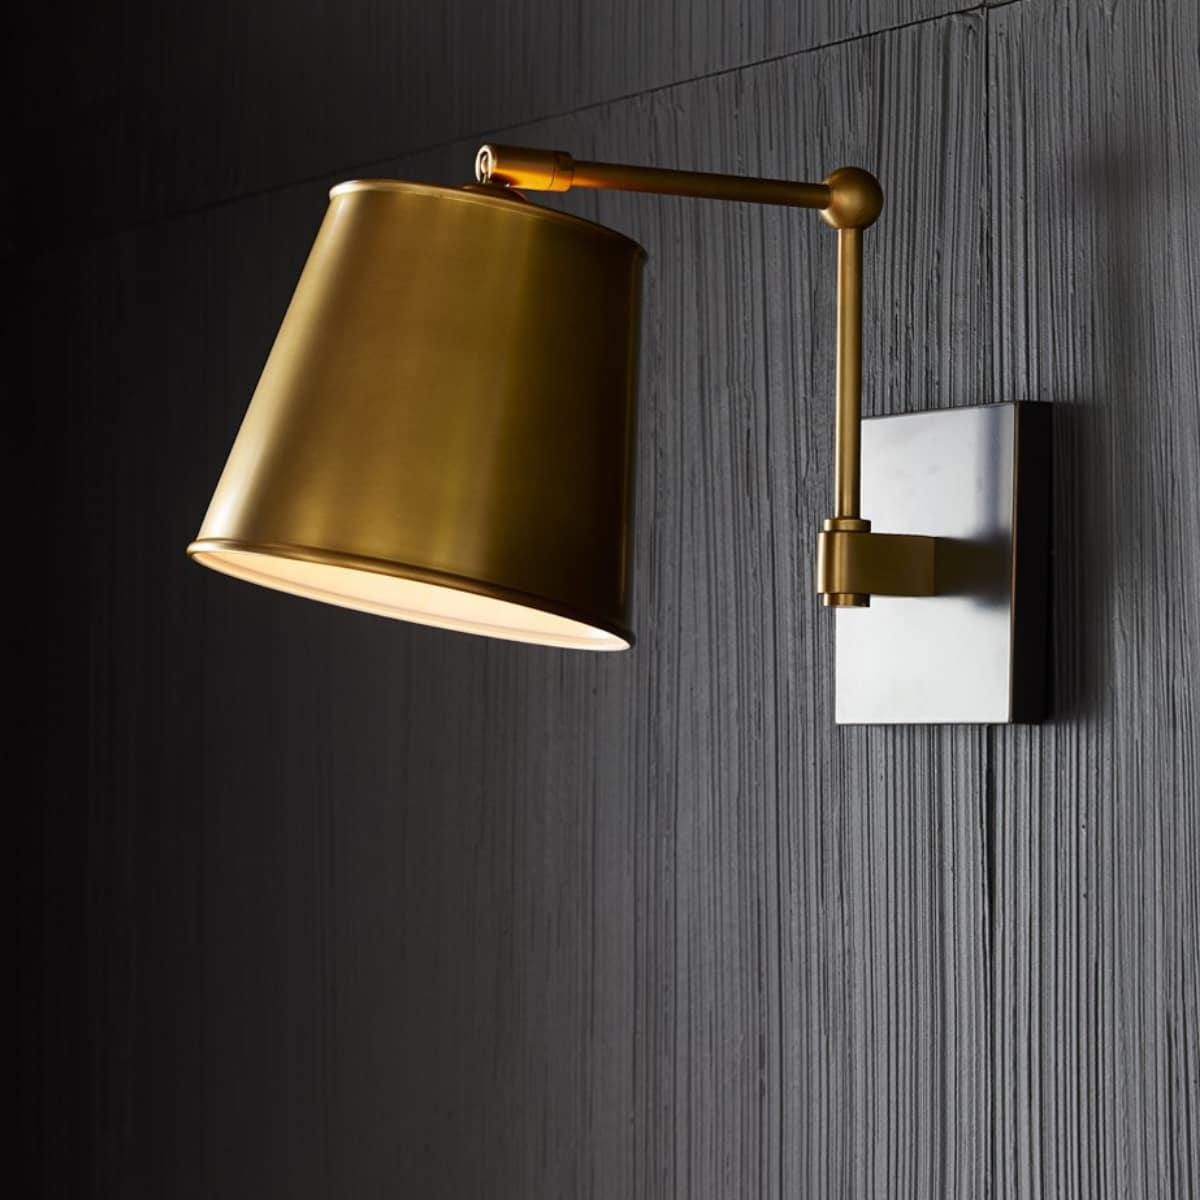 Stupendous porch lamps for your house